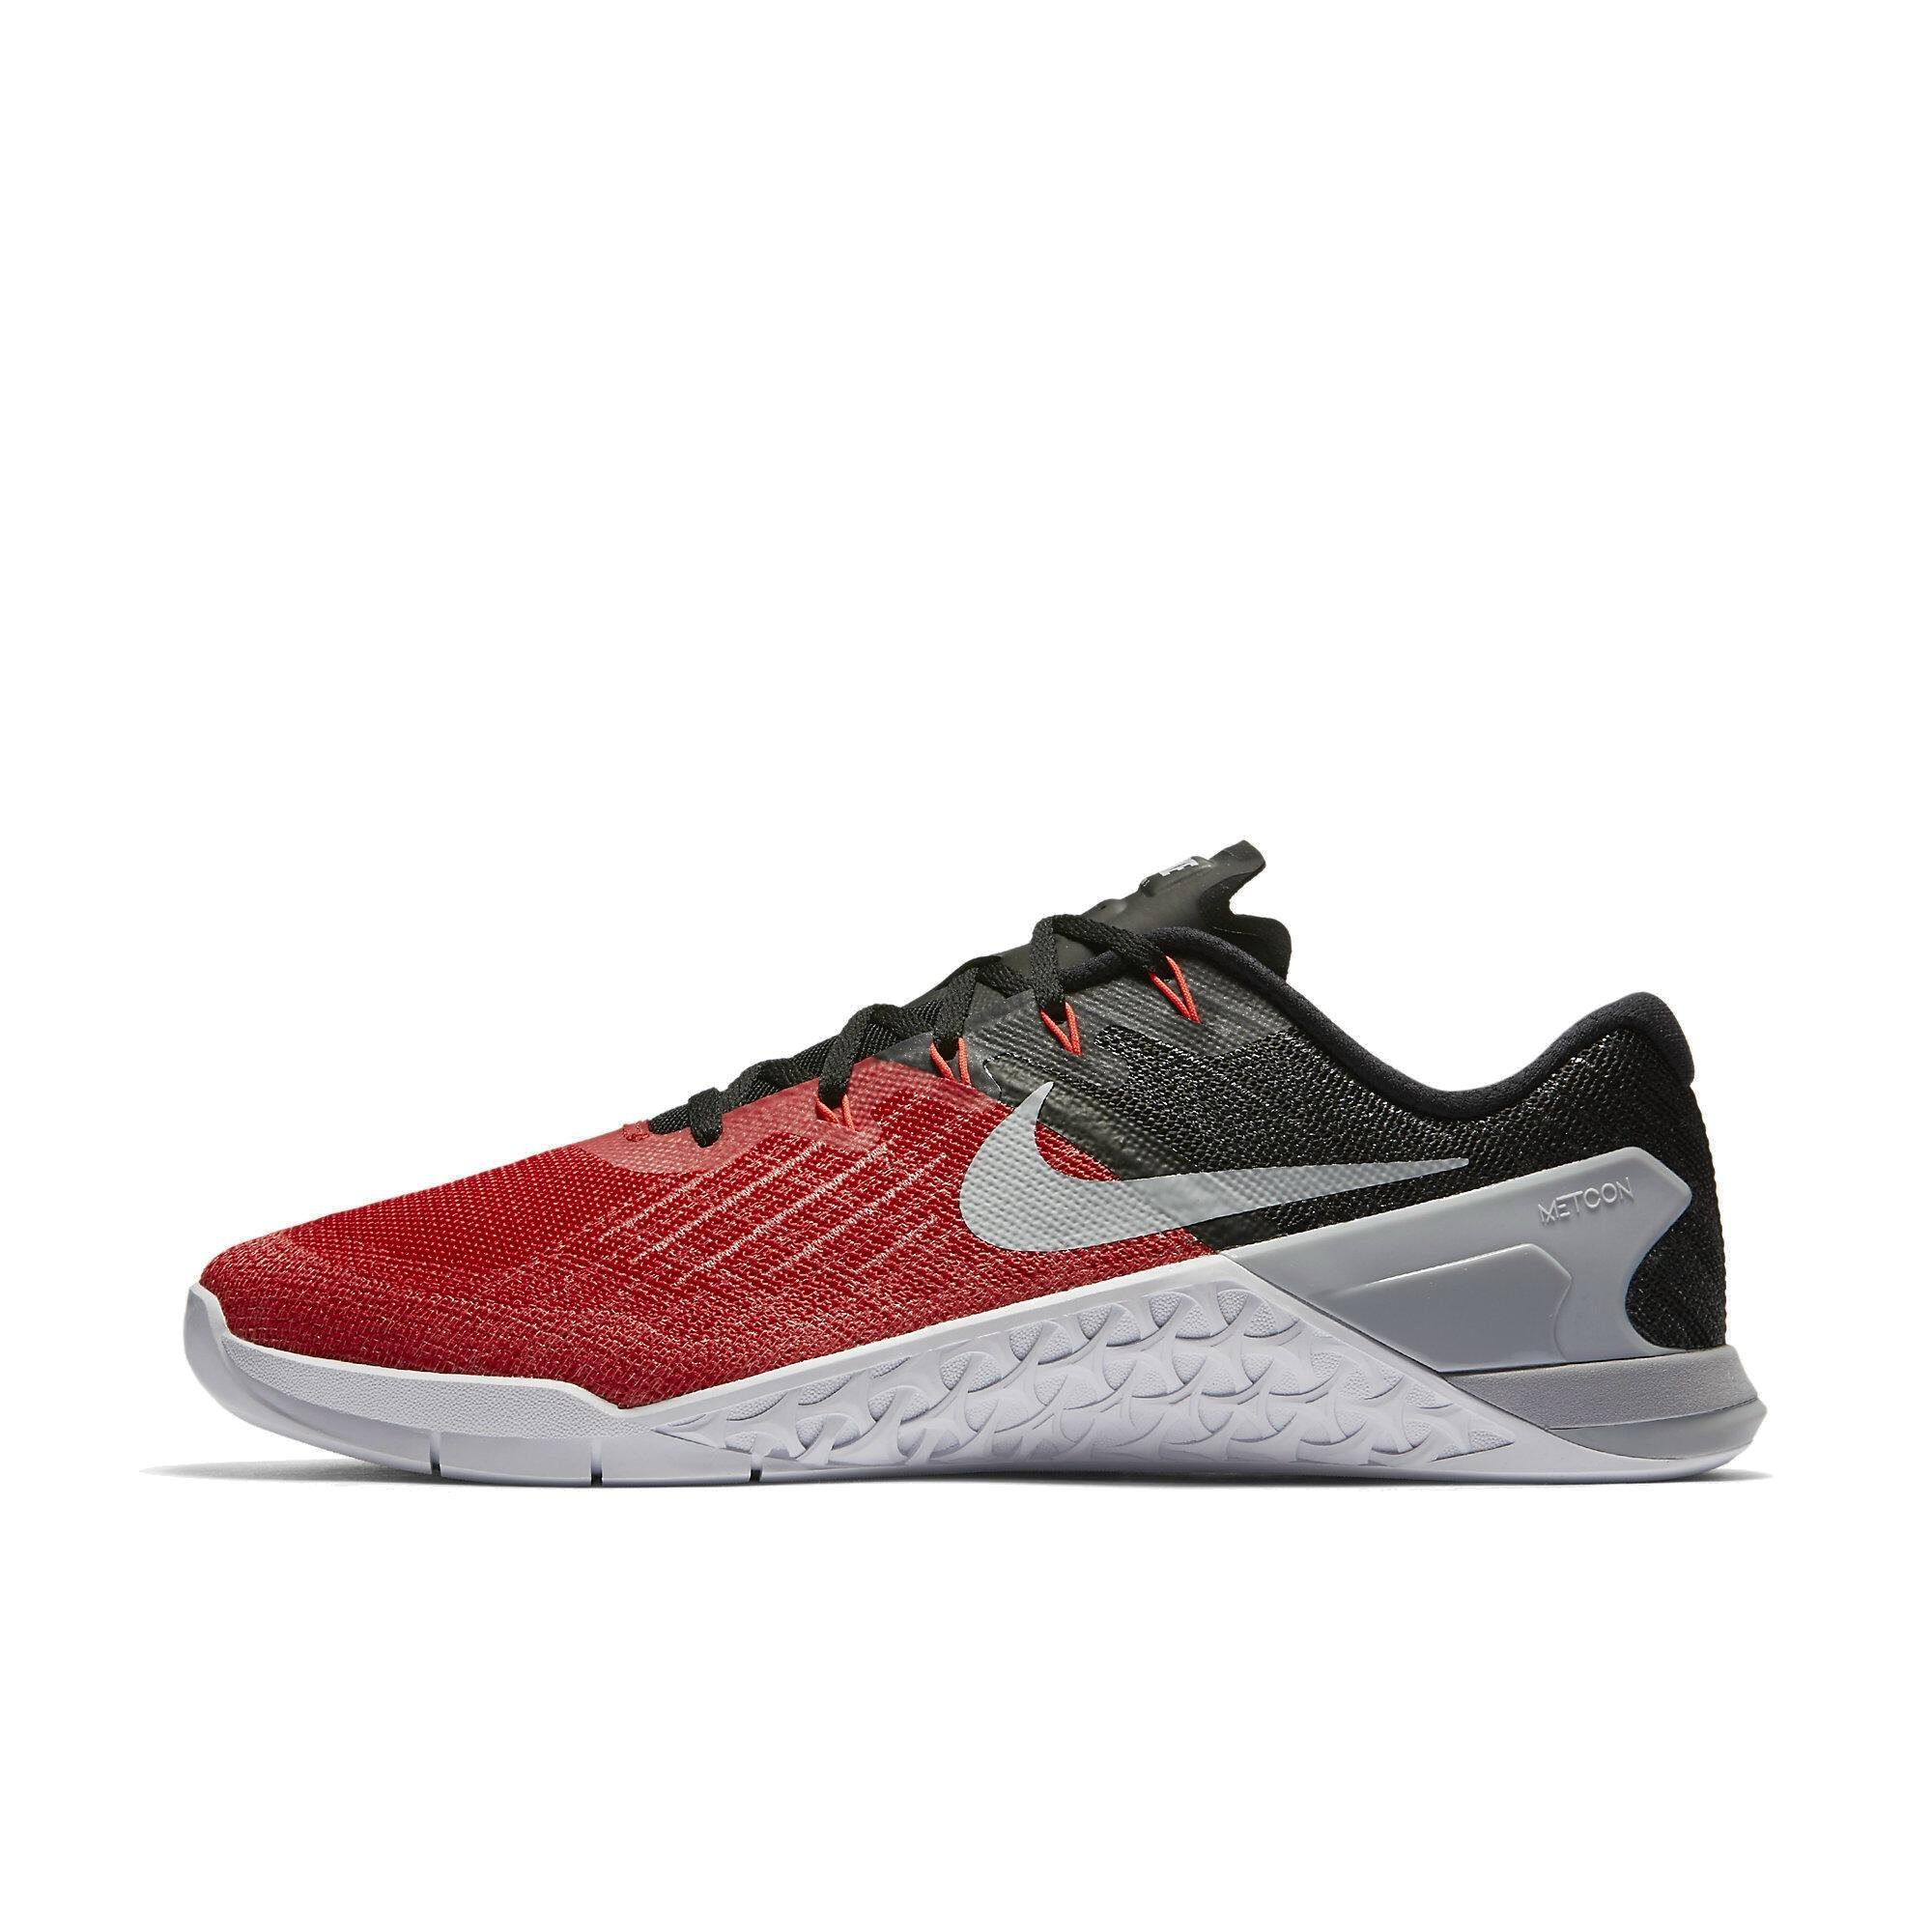 Nike Men's Metcon 3 Training Shoe University Red/Black/White/Wolf Grey 10 D(M) US